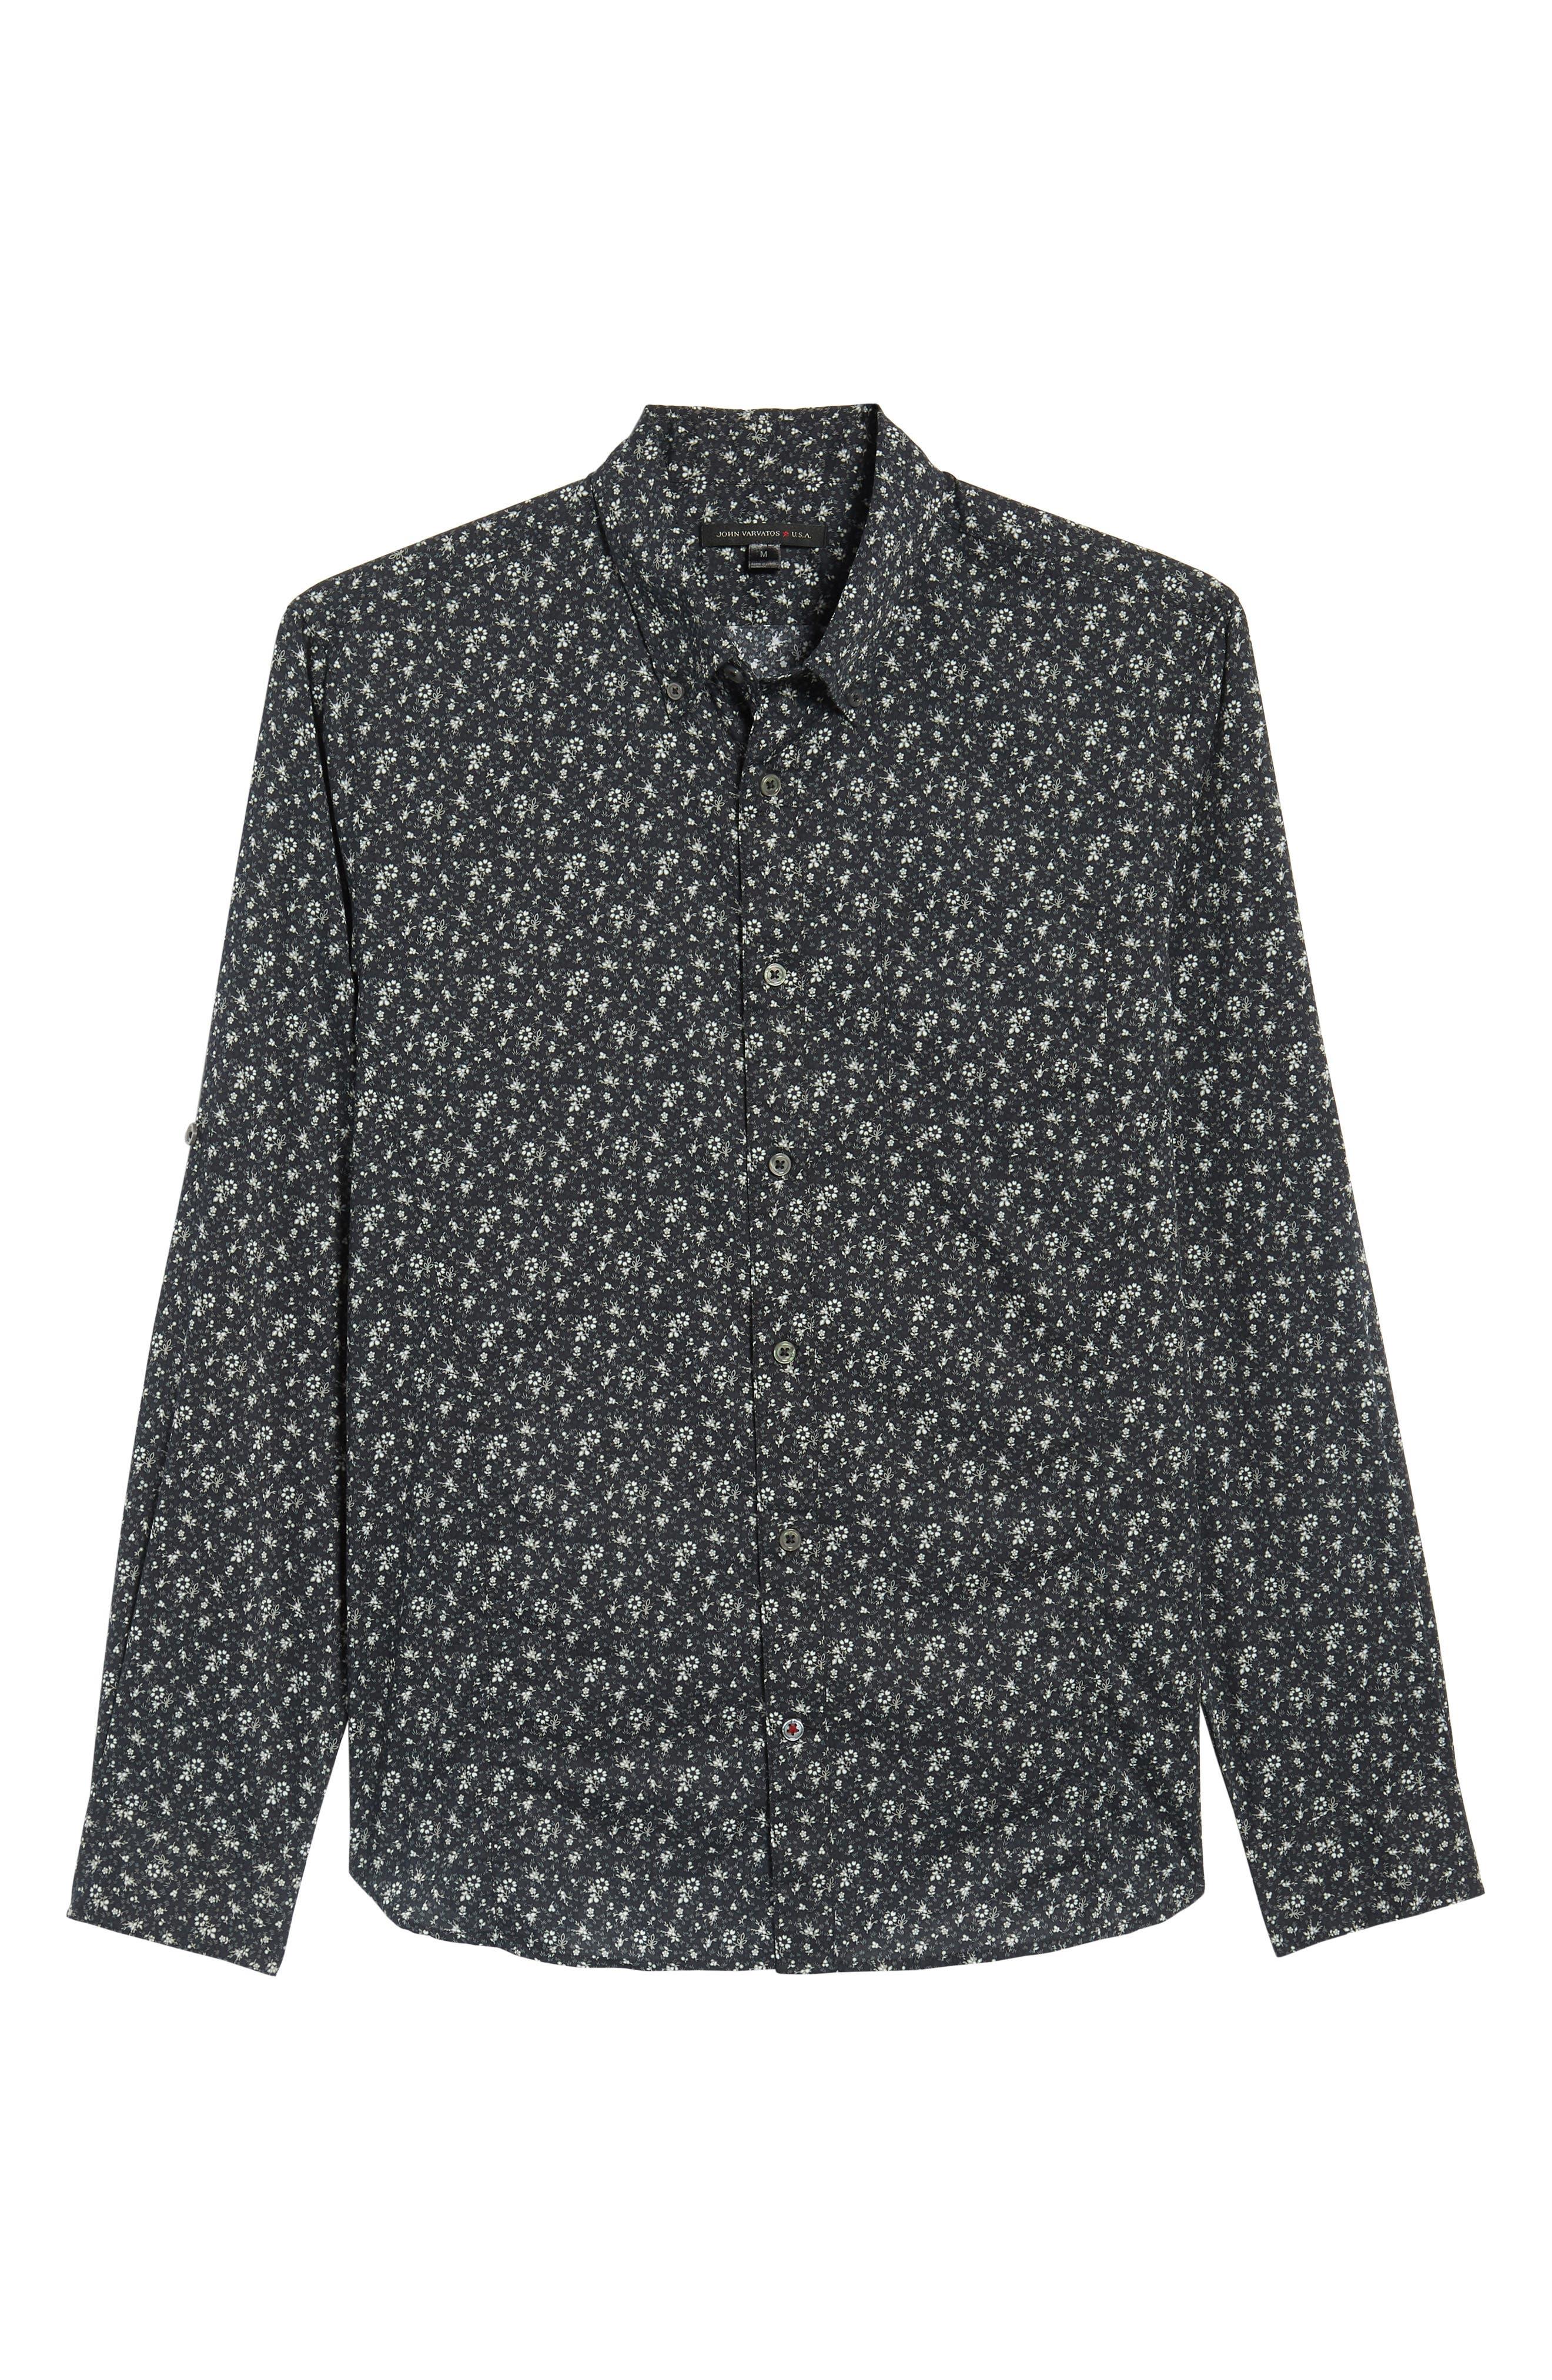 Extra Slim Fit Sport Shirt,                             Alternate thumbnail 6, color,                             012